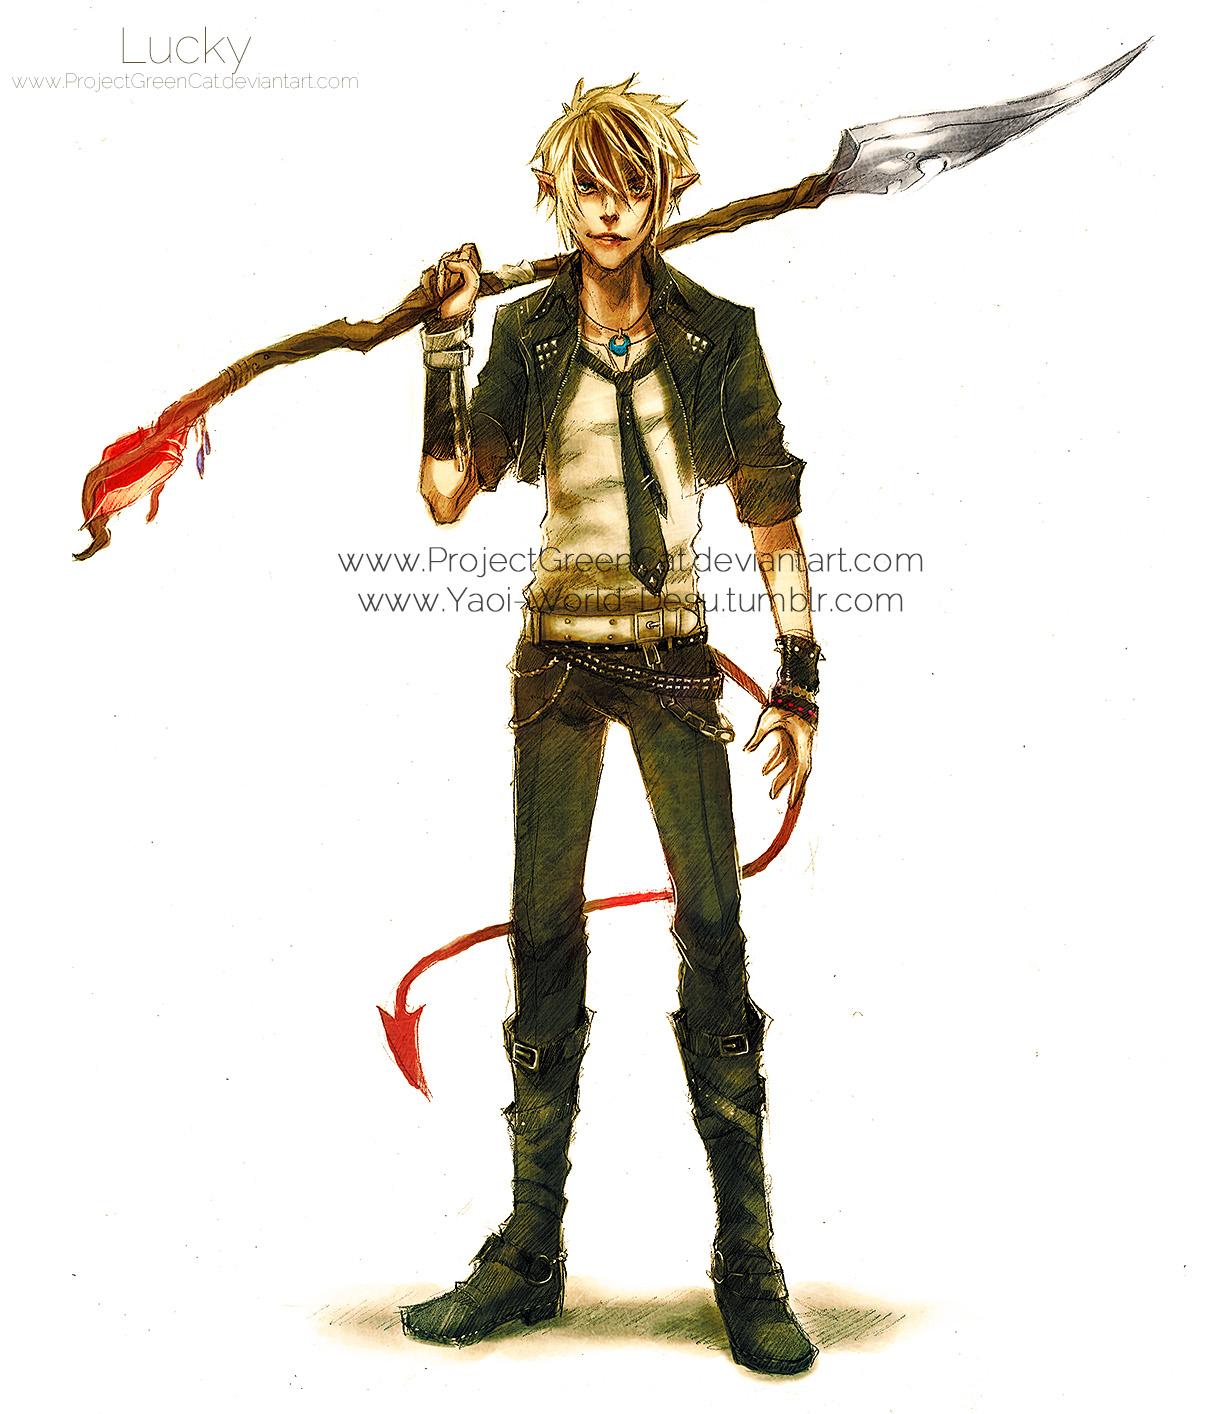 Anime Characters Full Body : Fullbody commission lucky by kodamacreative on deviantart